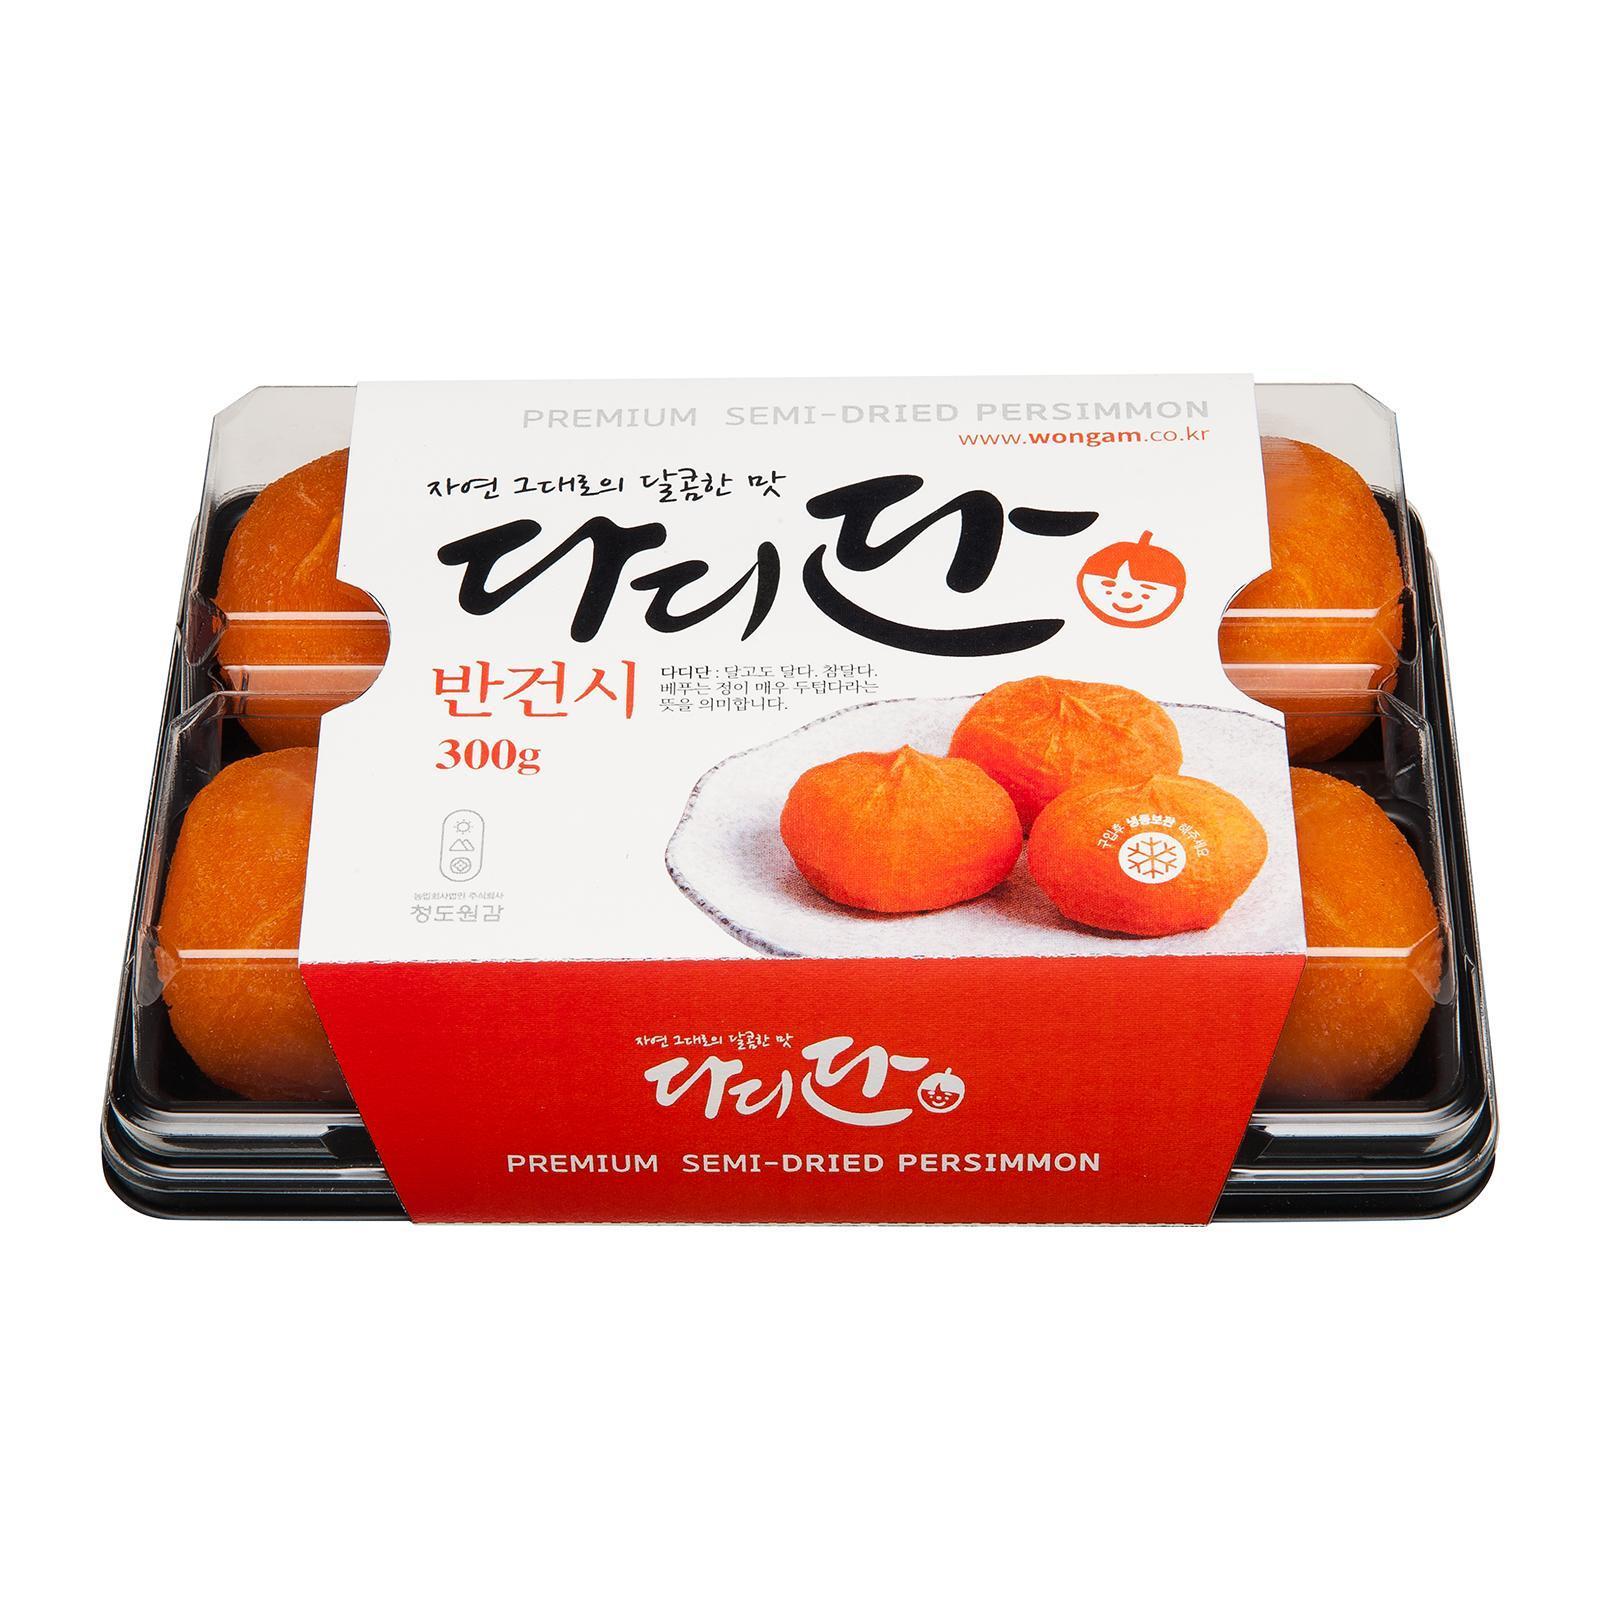 Dadidan Semi-Dried Persimmon - Frozen